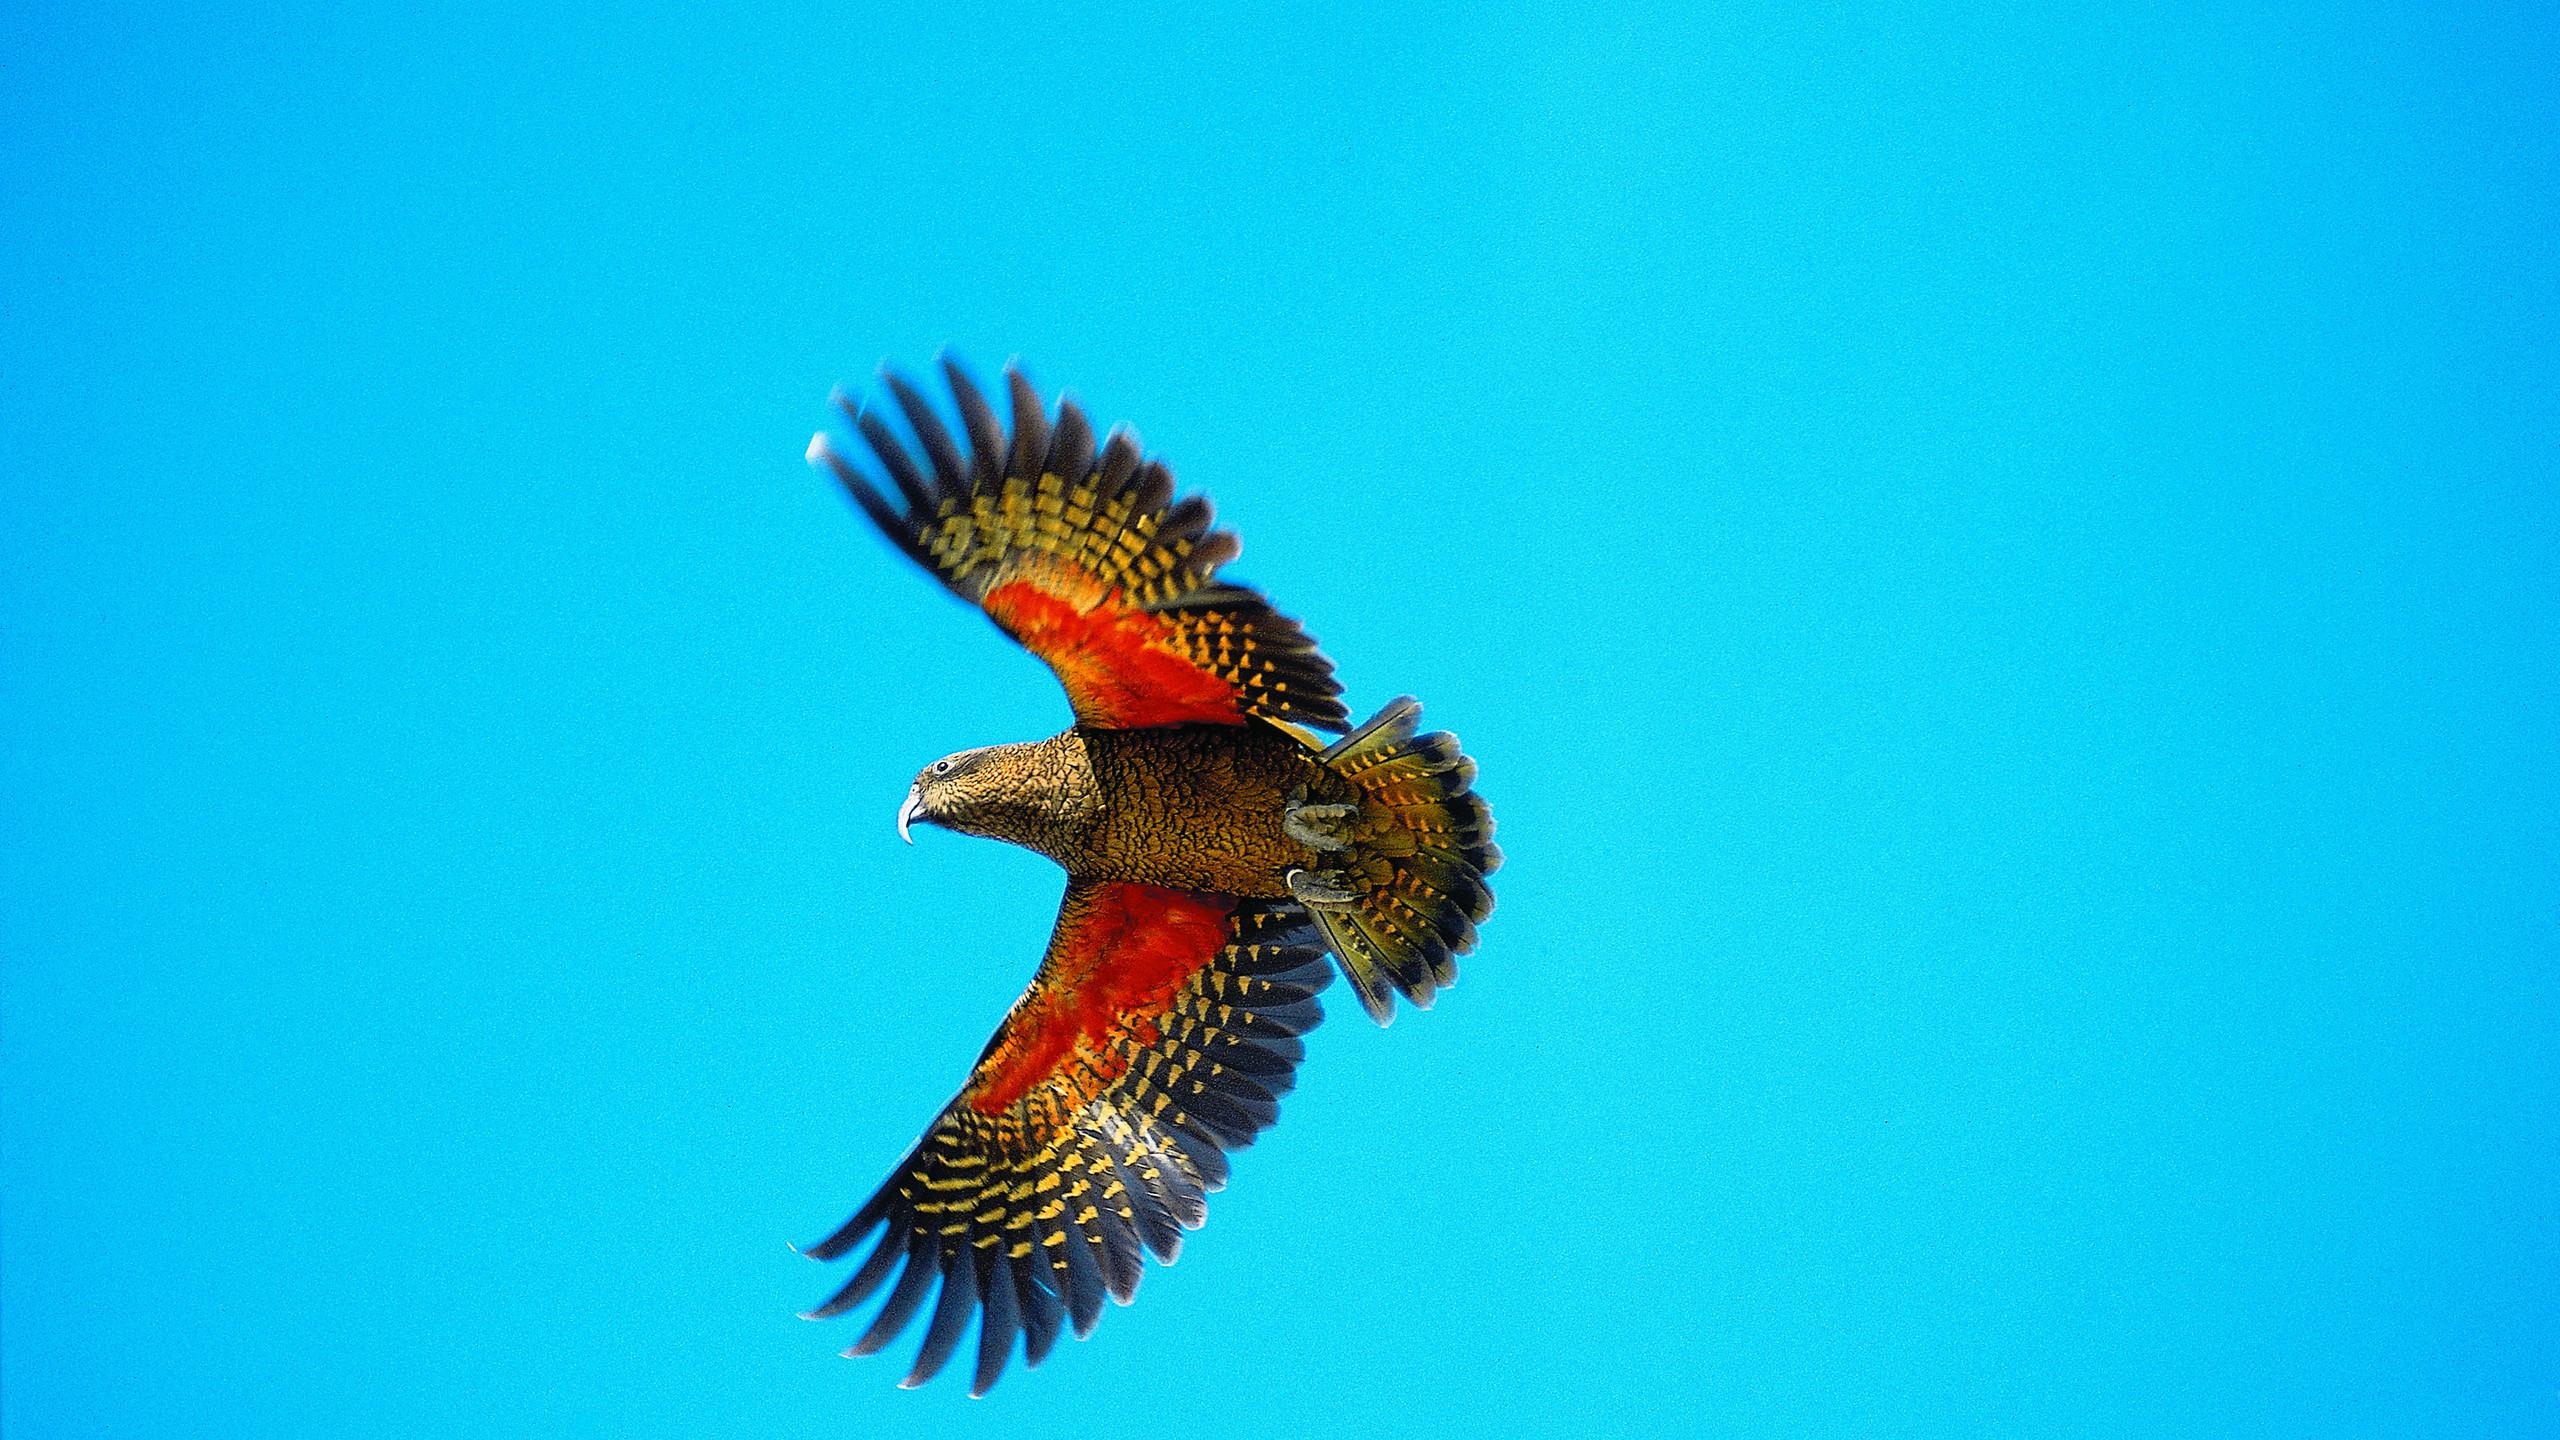 Kea parrot in Arthur's Pass National Park New Zealand